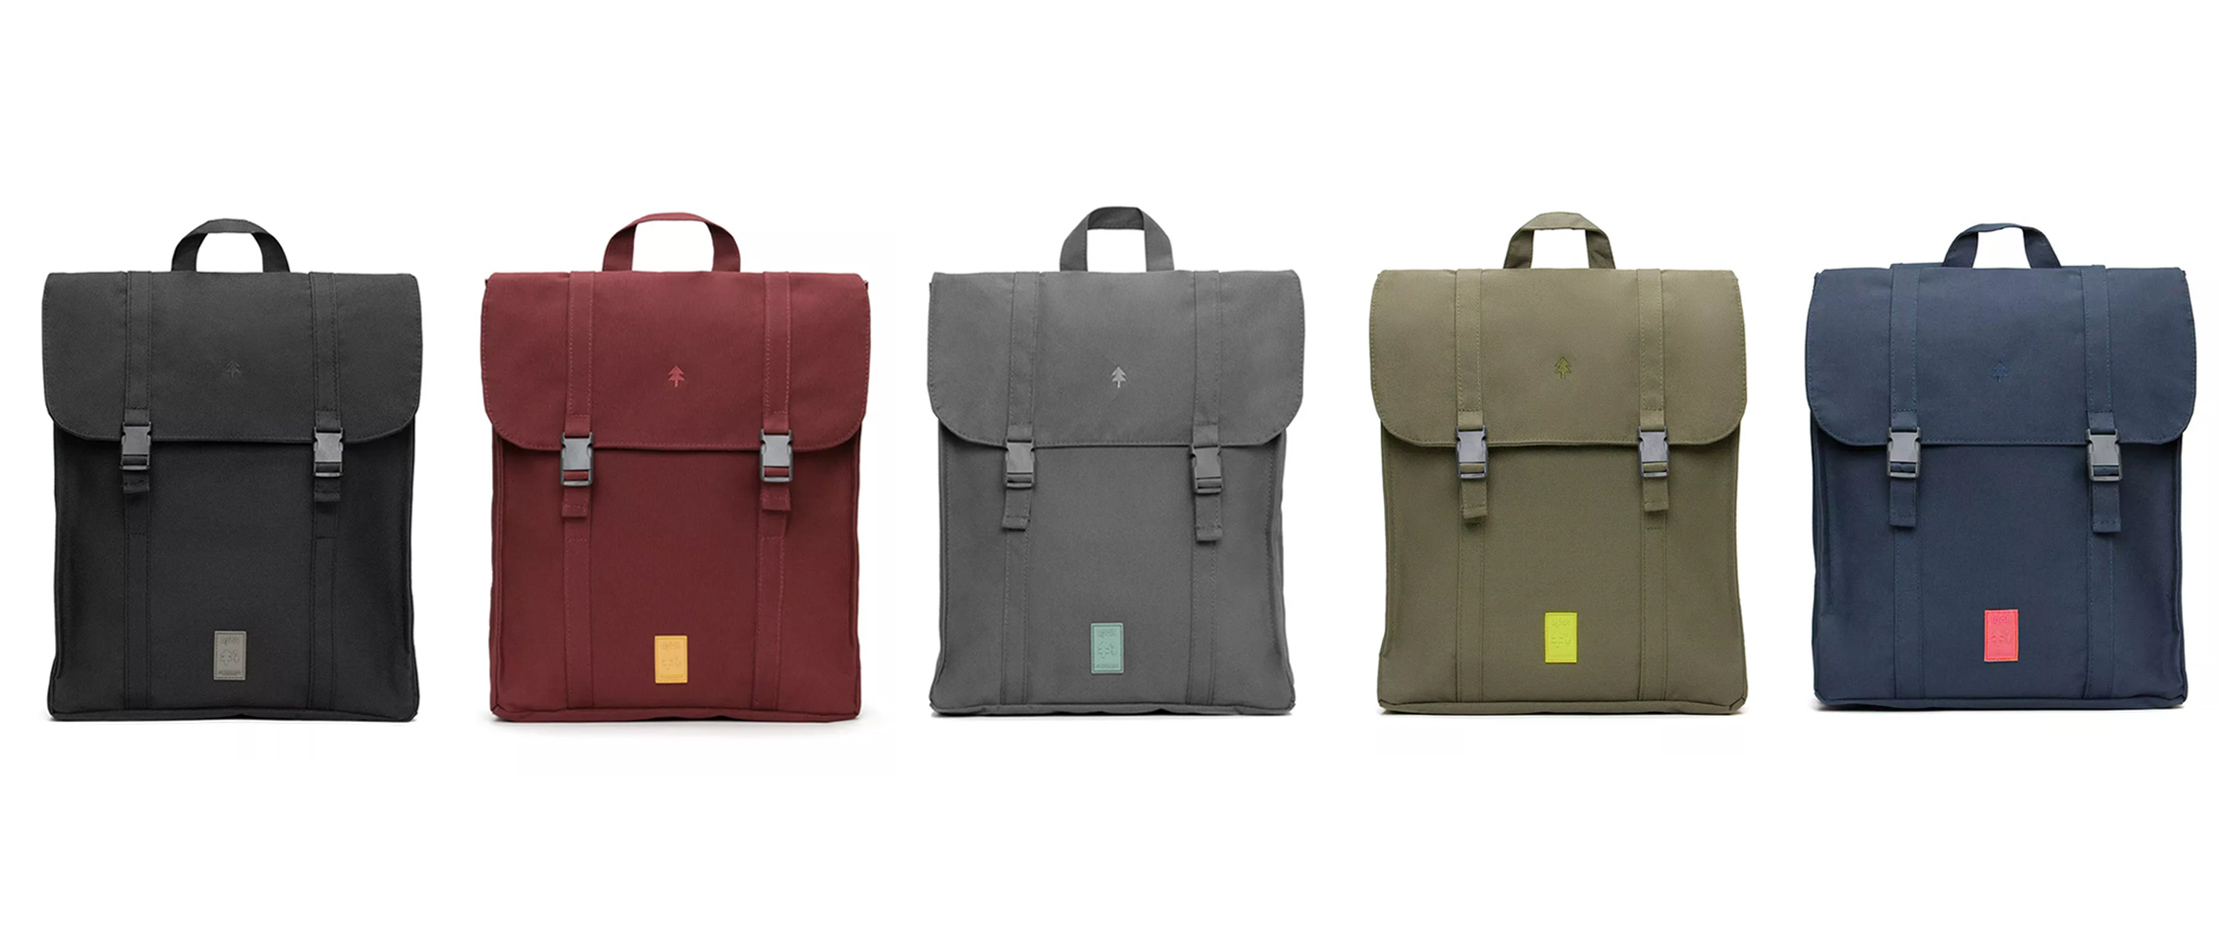 Lefrik Handy Backpack Colors